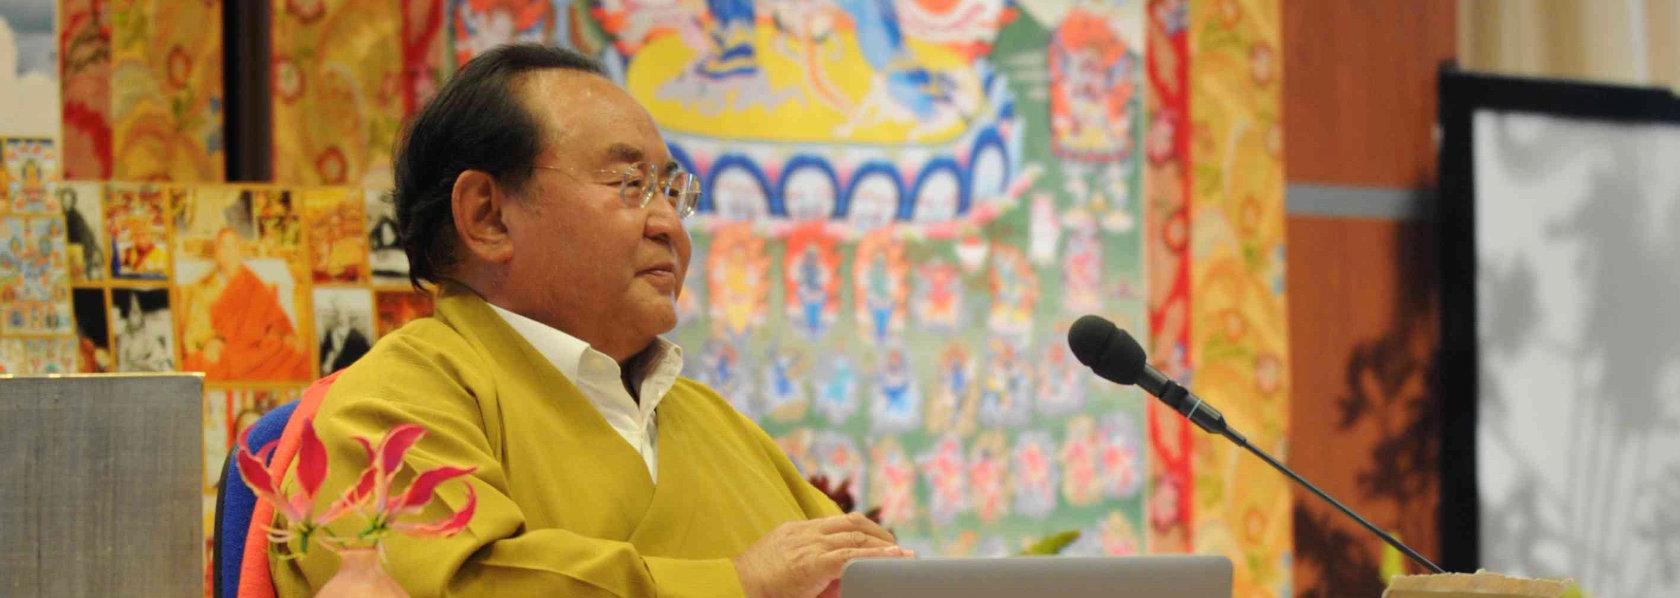 Sogyal Rinpoche giving Dharma talk - Guru in Disgrace - THIS Buddhist Film Festival